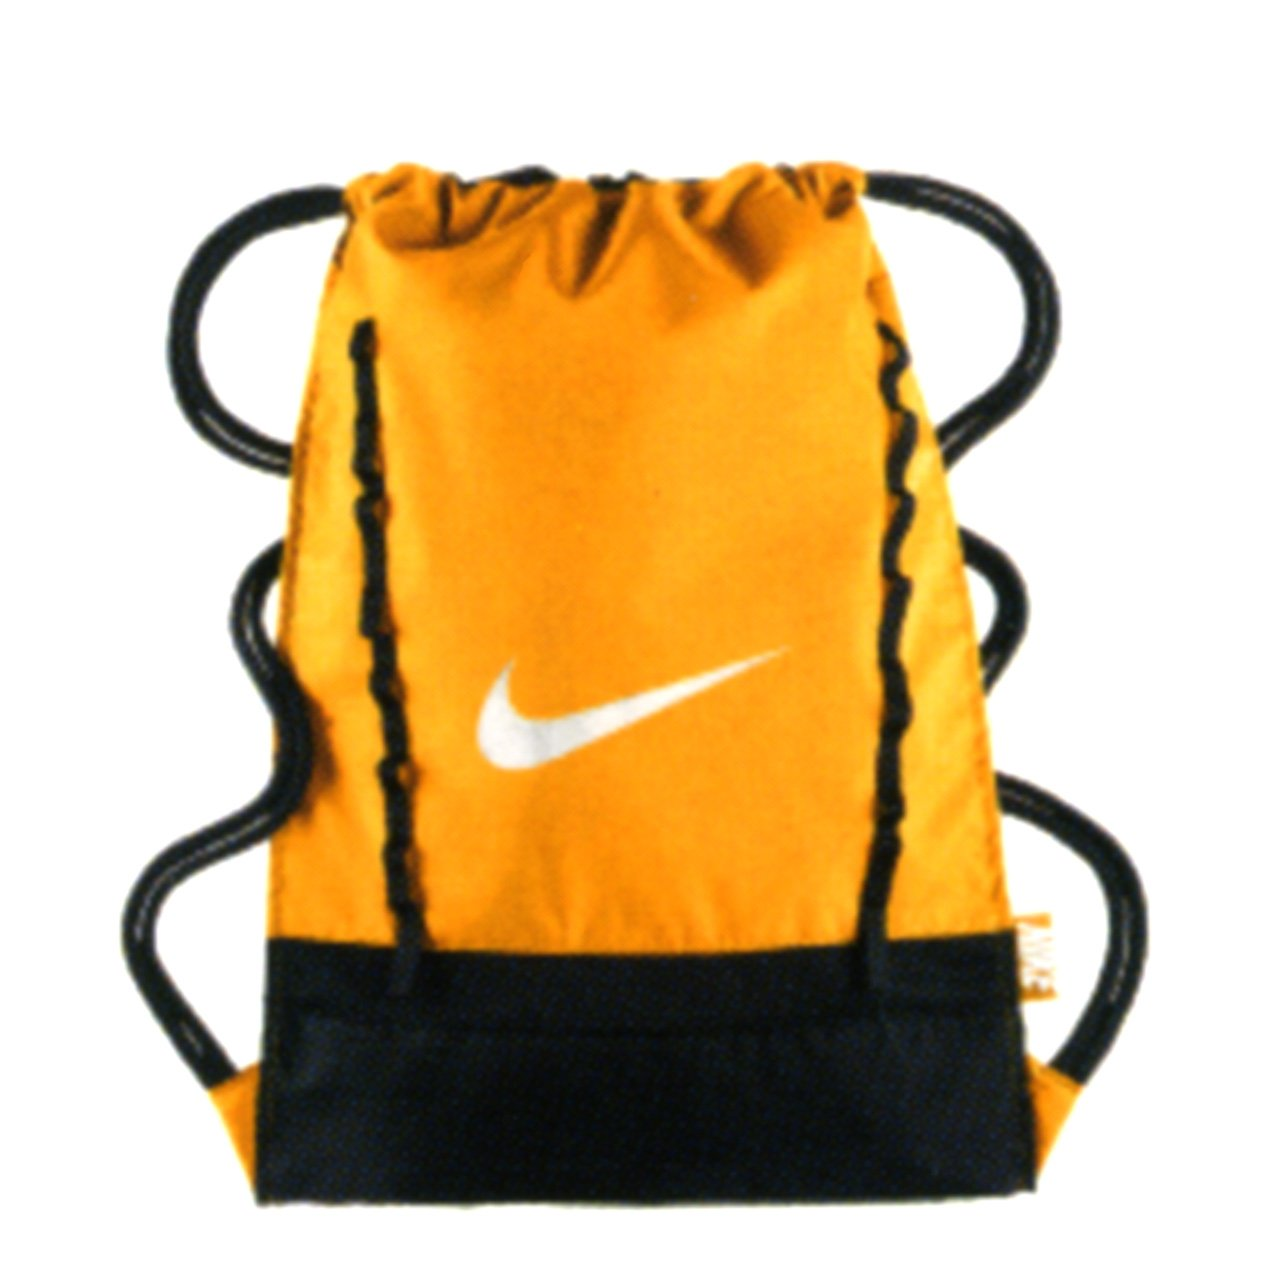 27ccff1c40a3 Bingua.com - Nike Brasilia 7 Gym Sack Black/White Size One Size